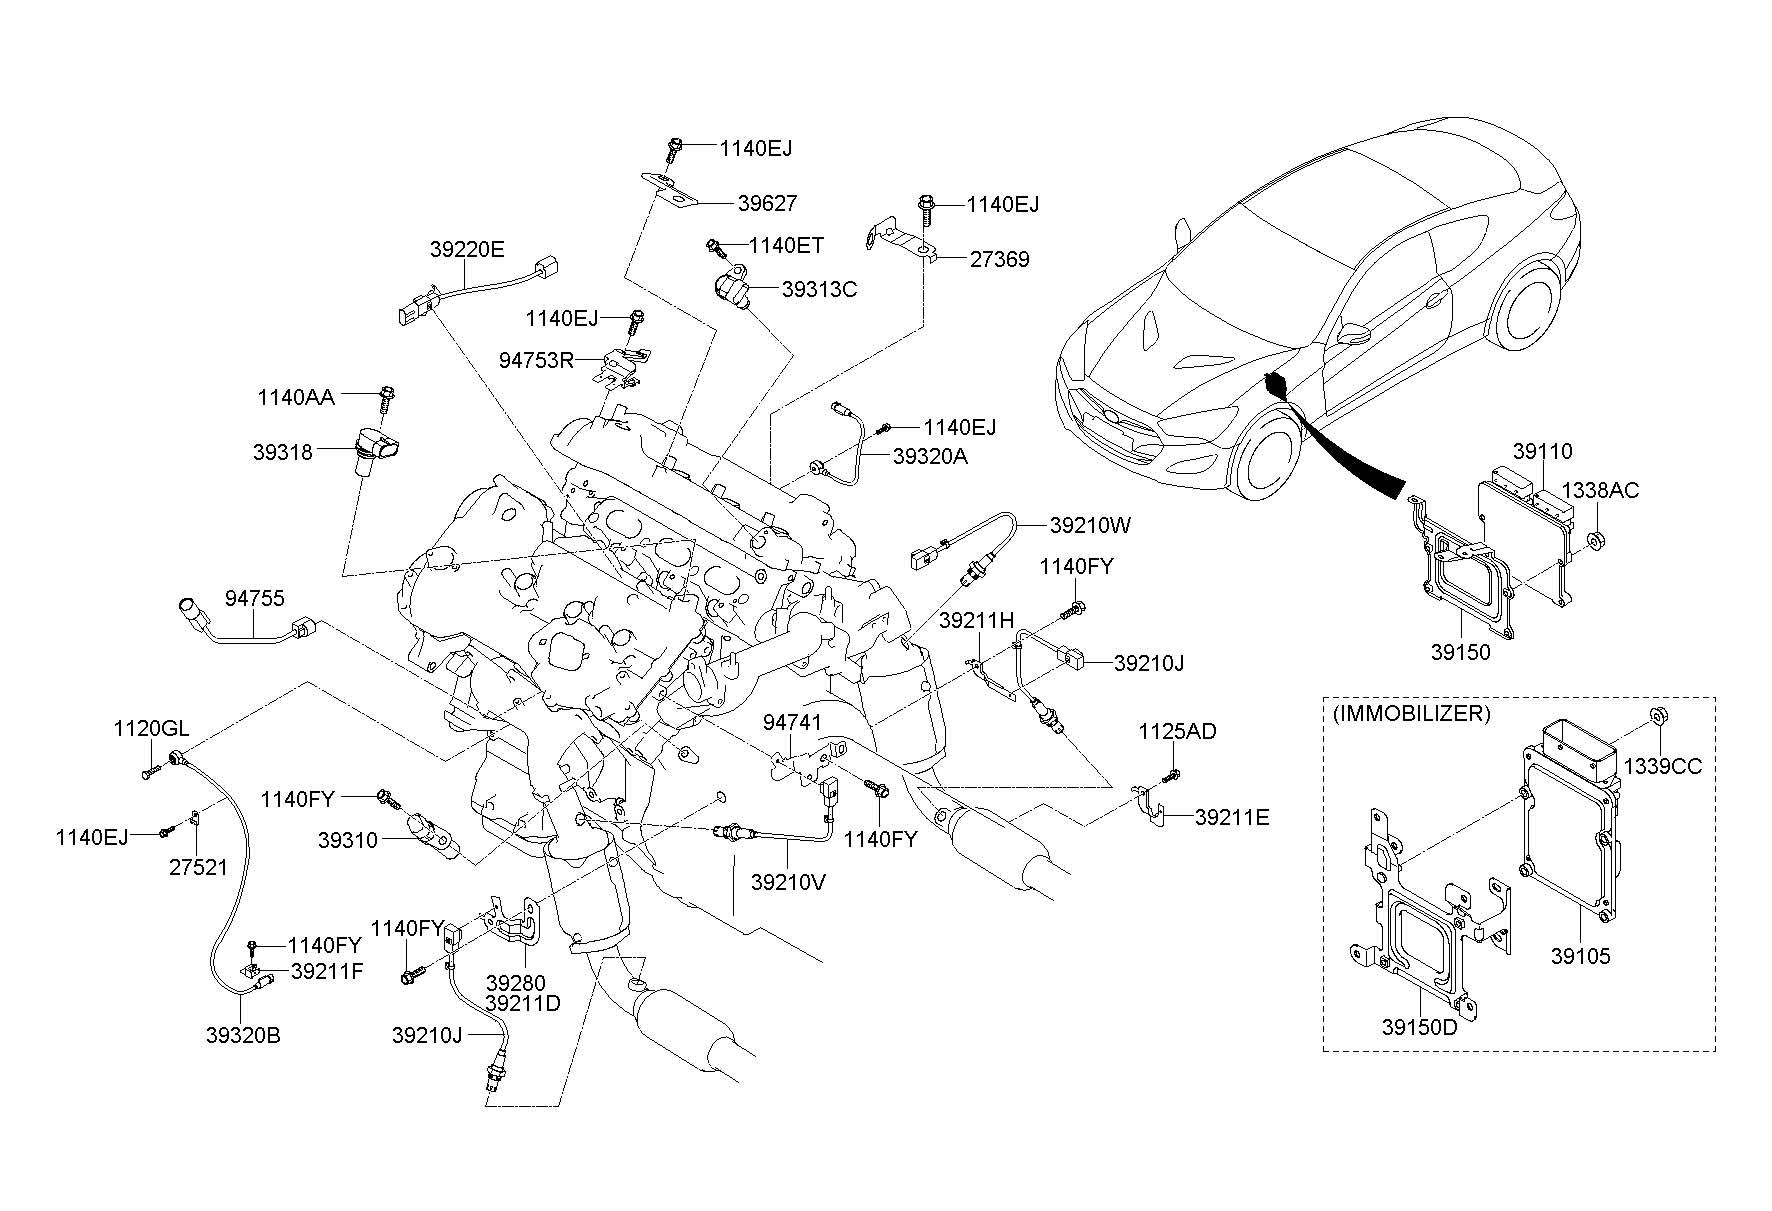 2002 hyundai santa fe parts diagram renault kangoo wiring 2015 genesis html autos post